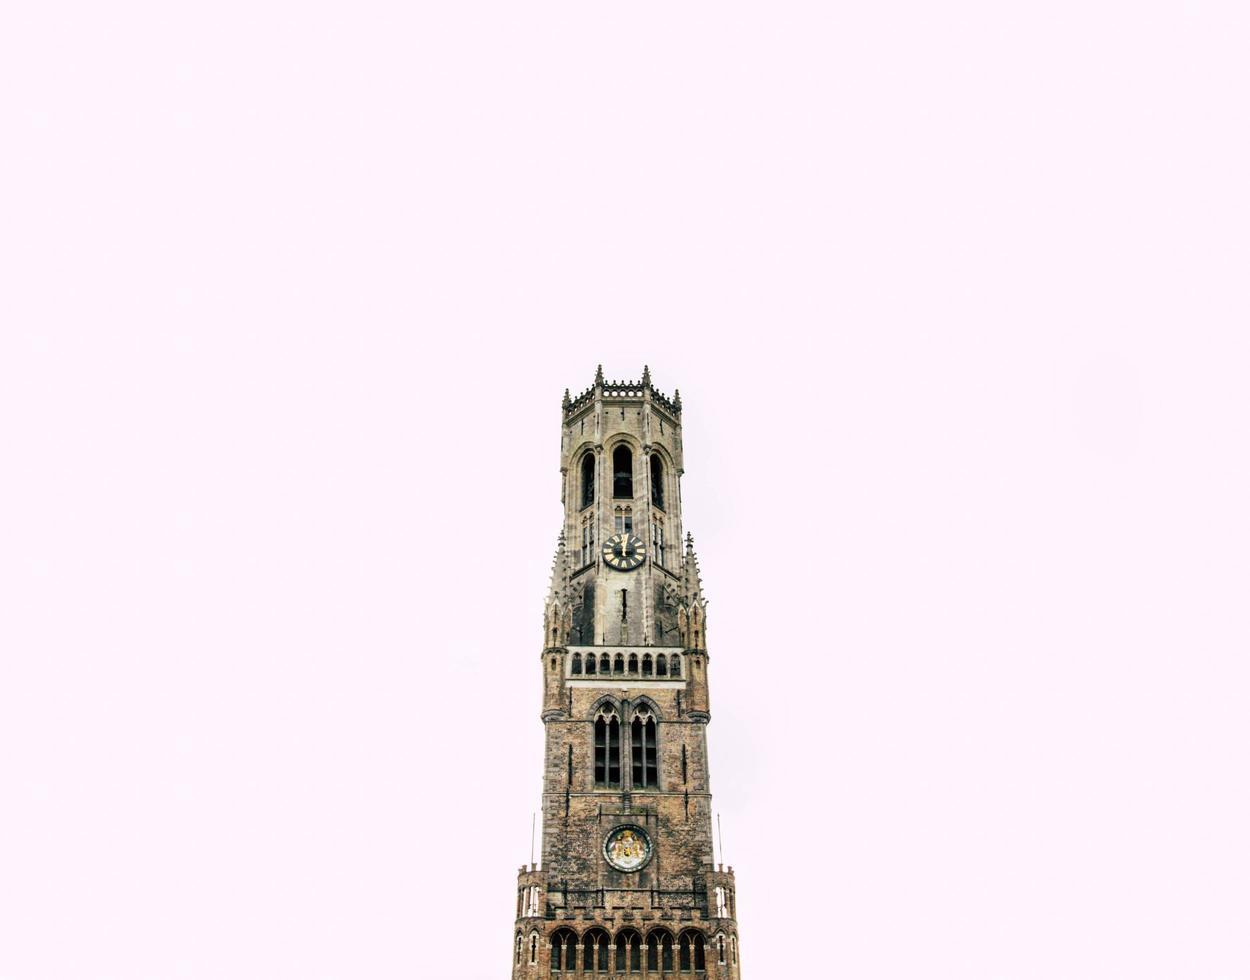 Bruges, Belgium, 2020 - Belfry of Bruges during the day photo